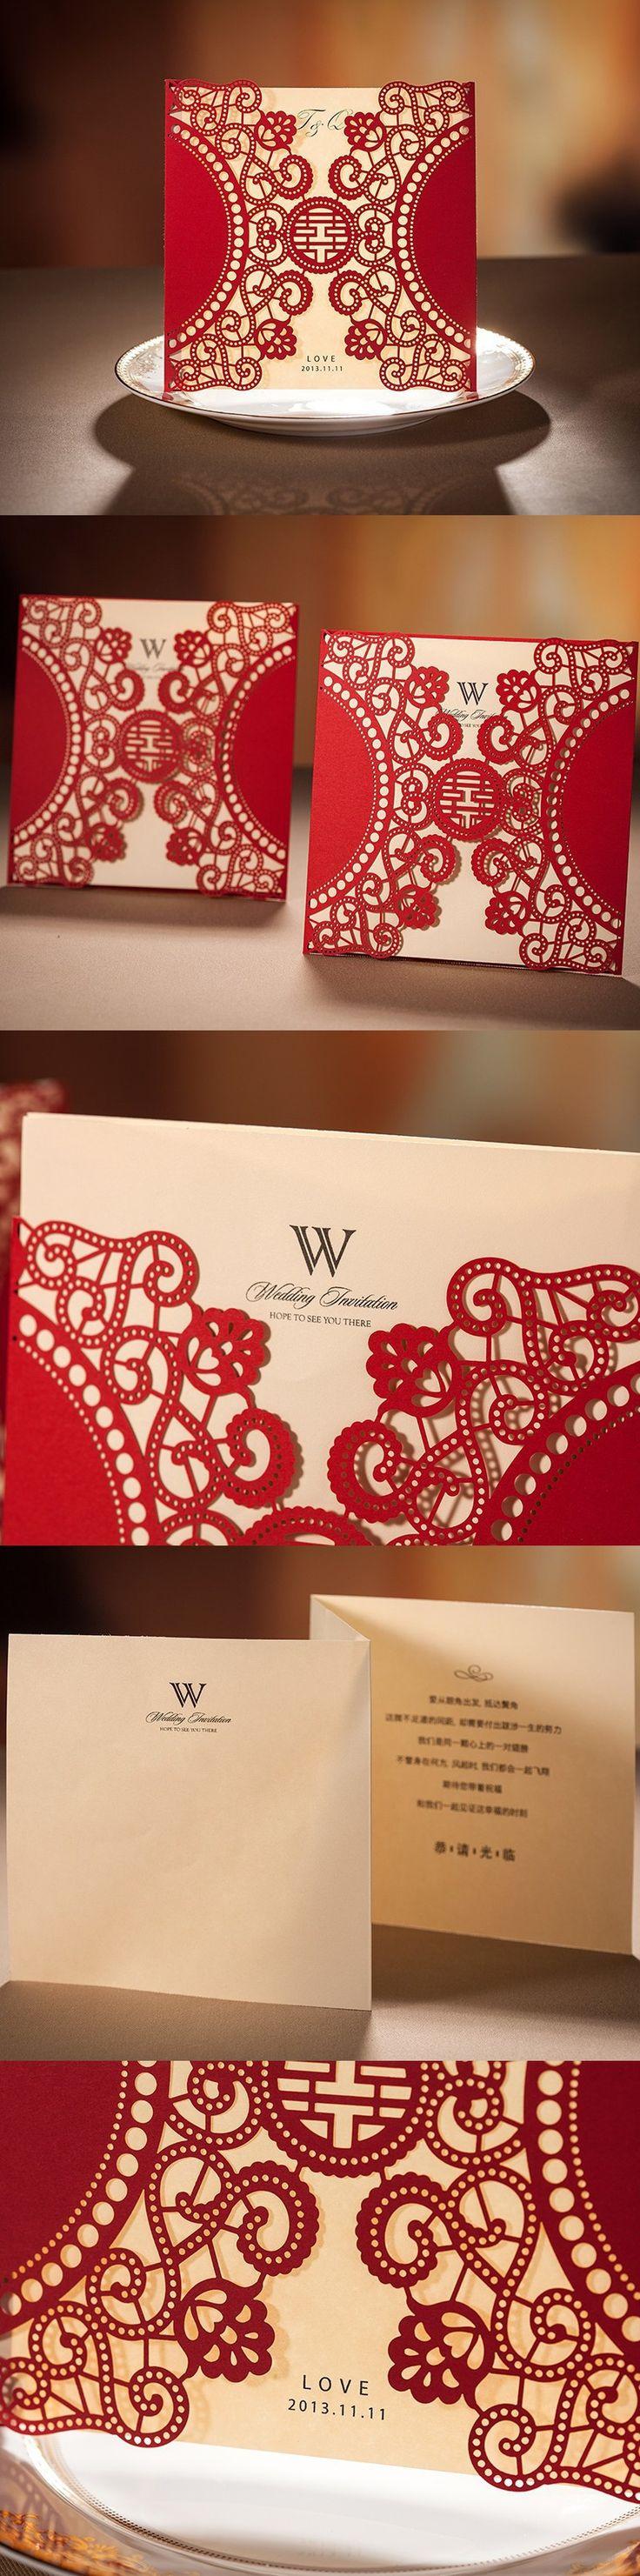 51 best Shanghai Deco images on Pinterest | Shanghai, Red wedding ...